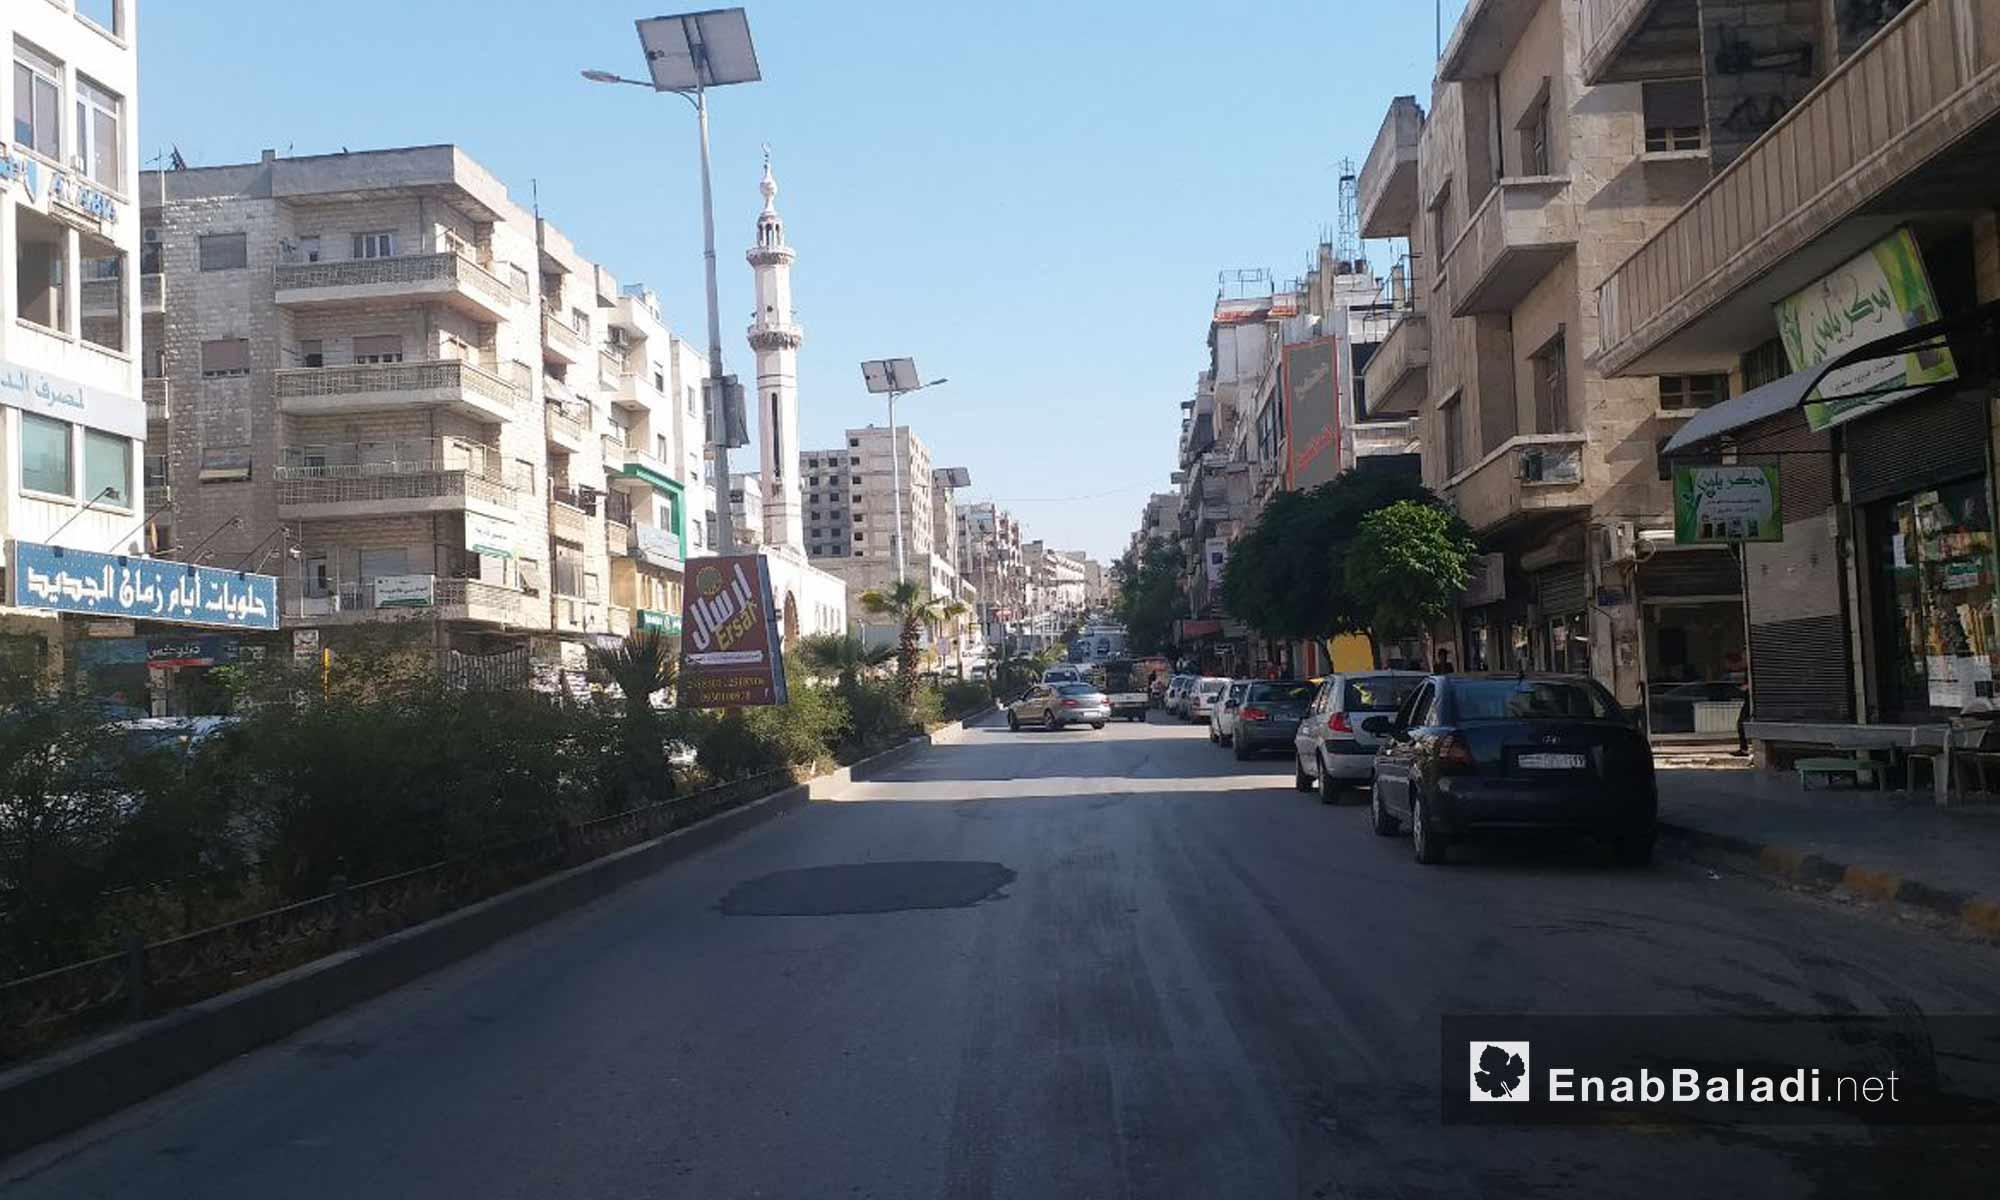 Al-Alamain street in Hama city – May 18, 2019 (Enab Baladi)